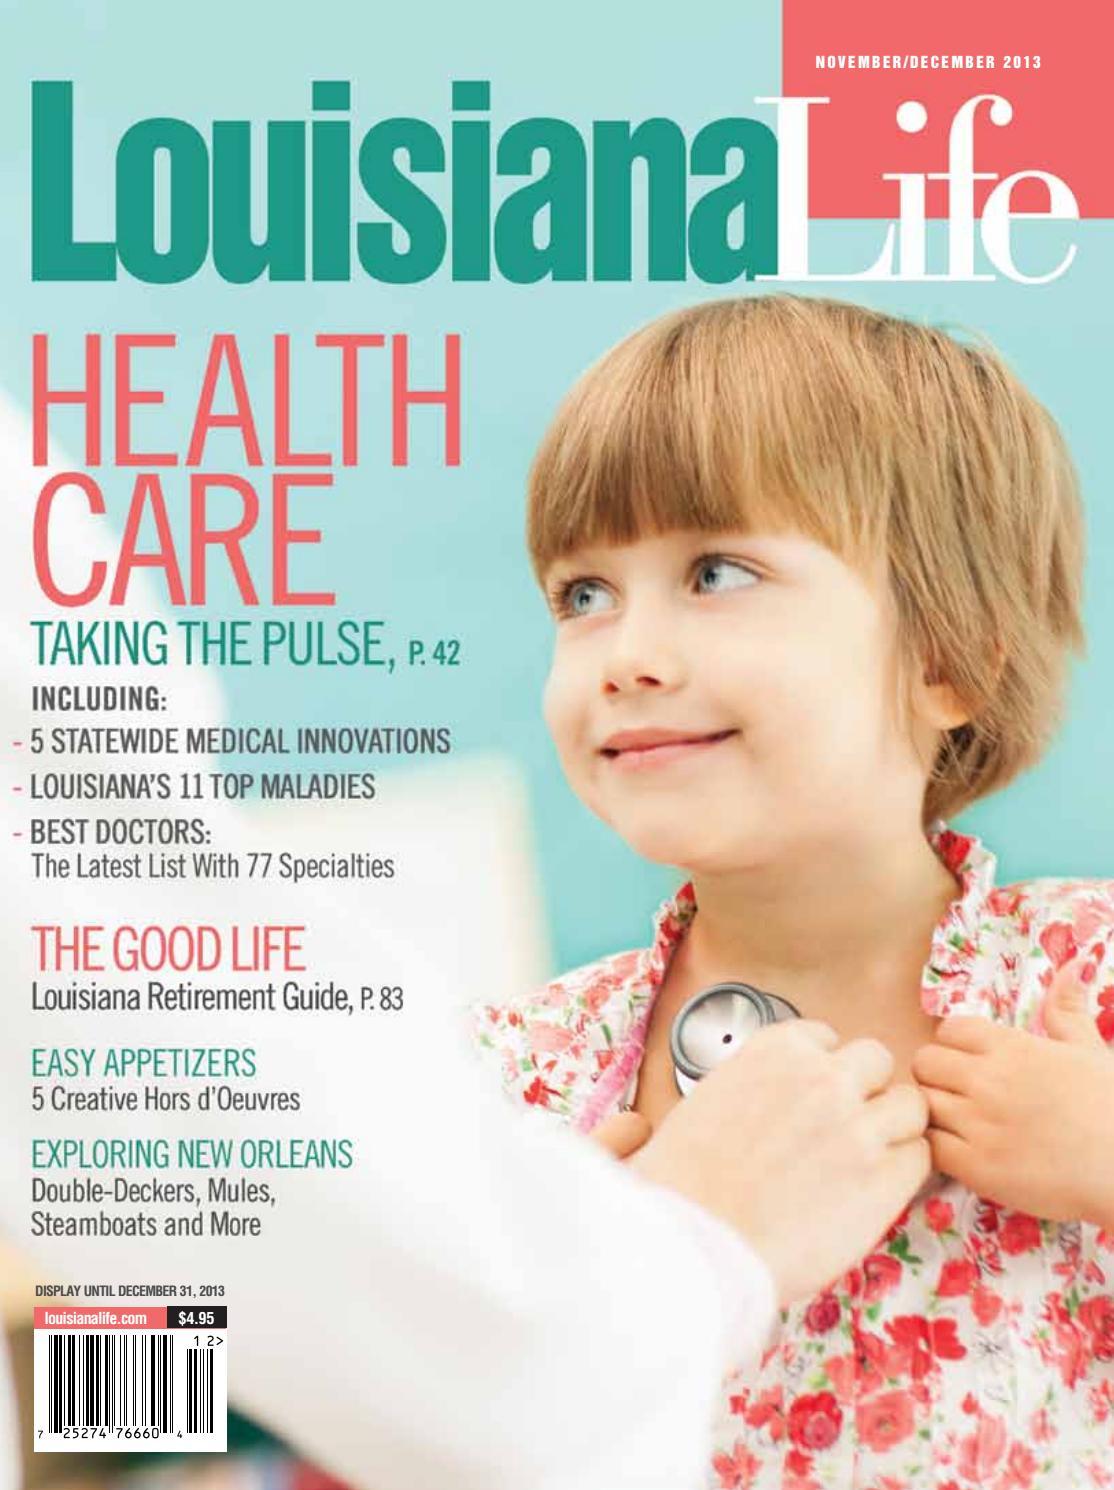 9642a38a3 Louisiana Life November-December 2013 by Renaissance Publishing - issuu